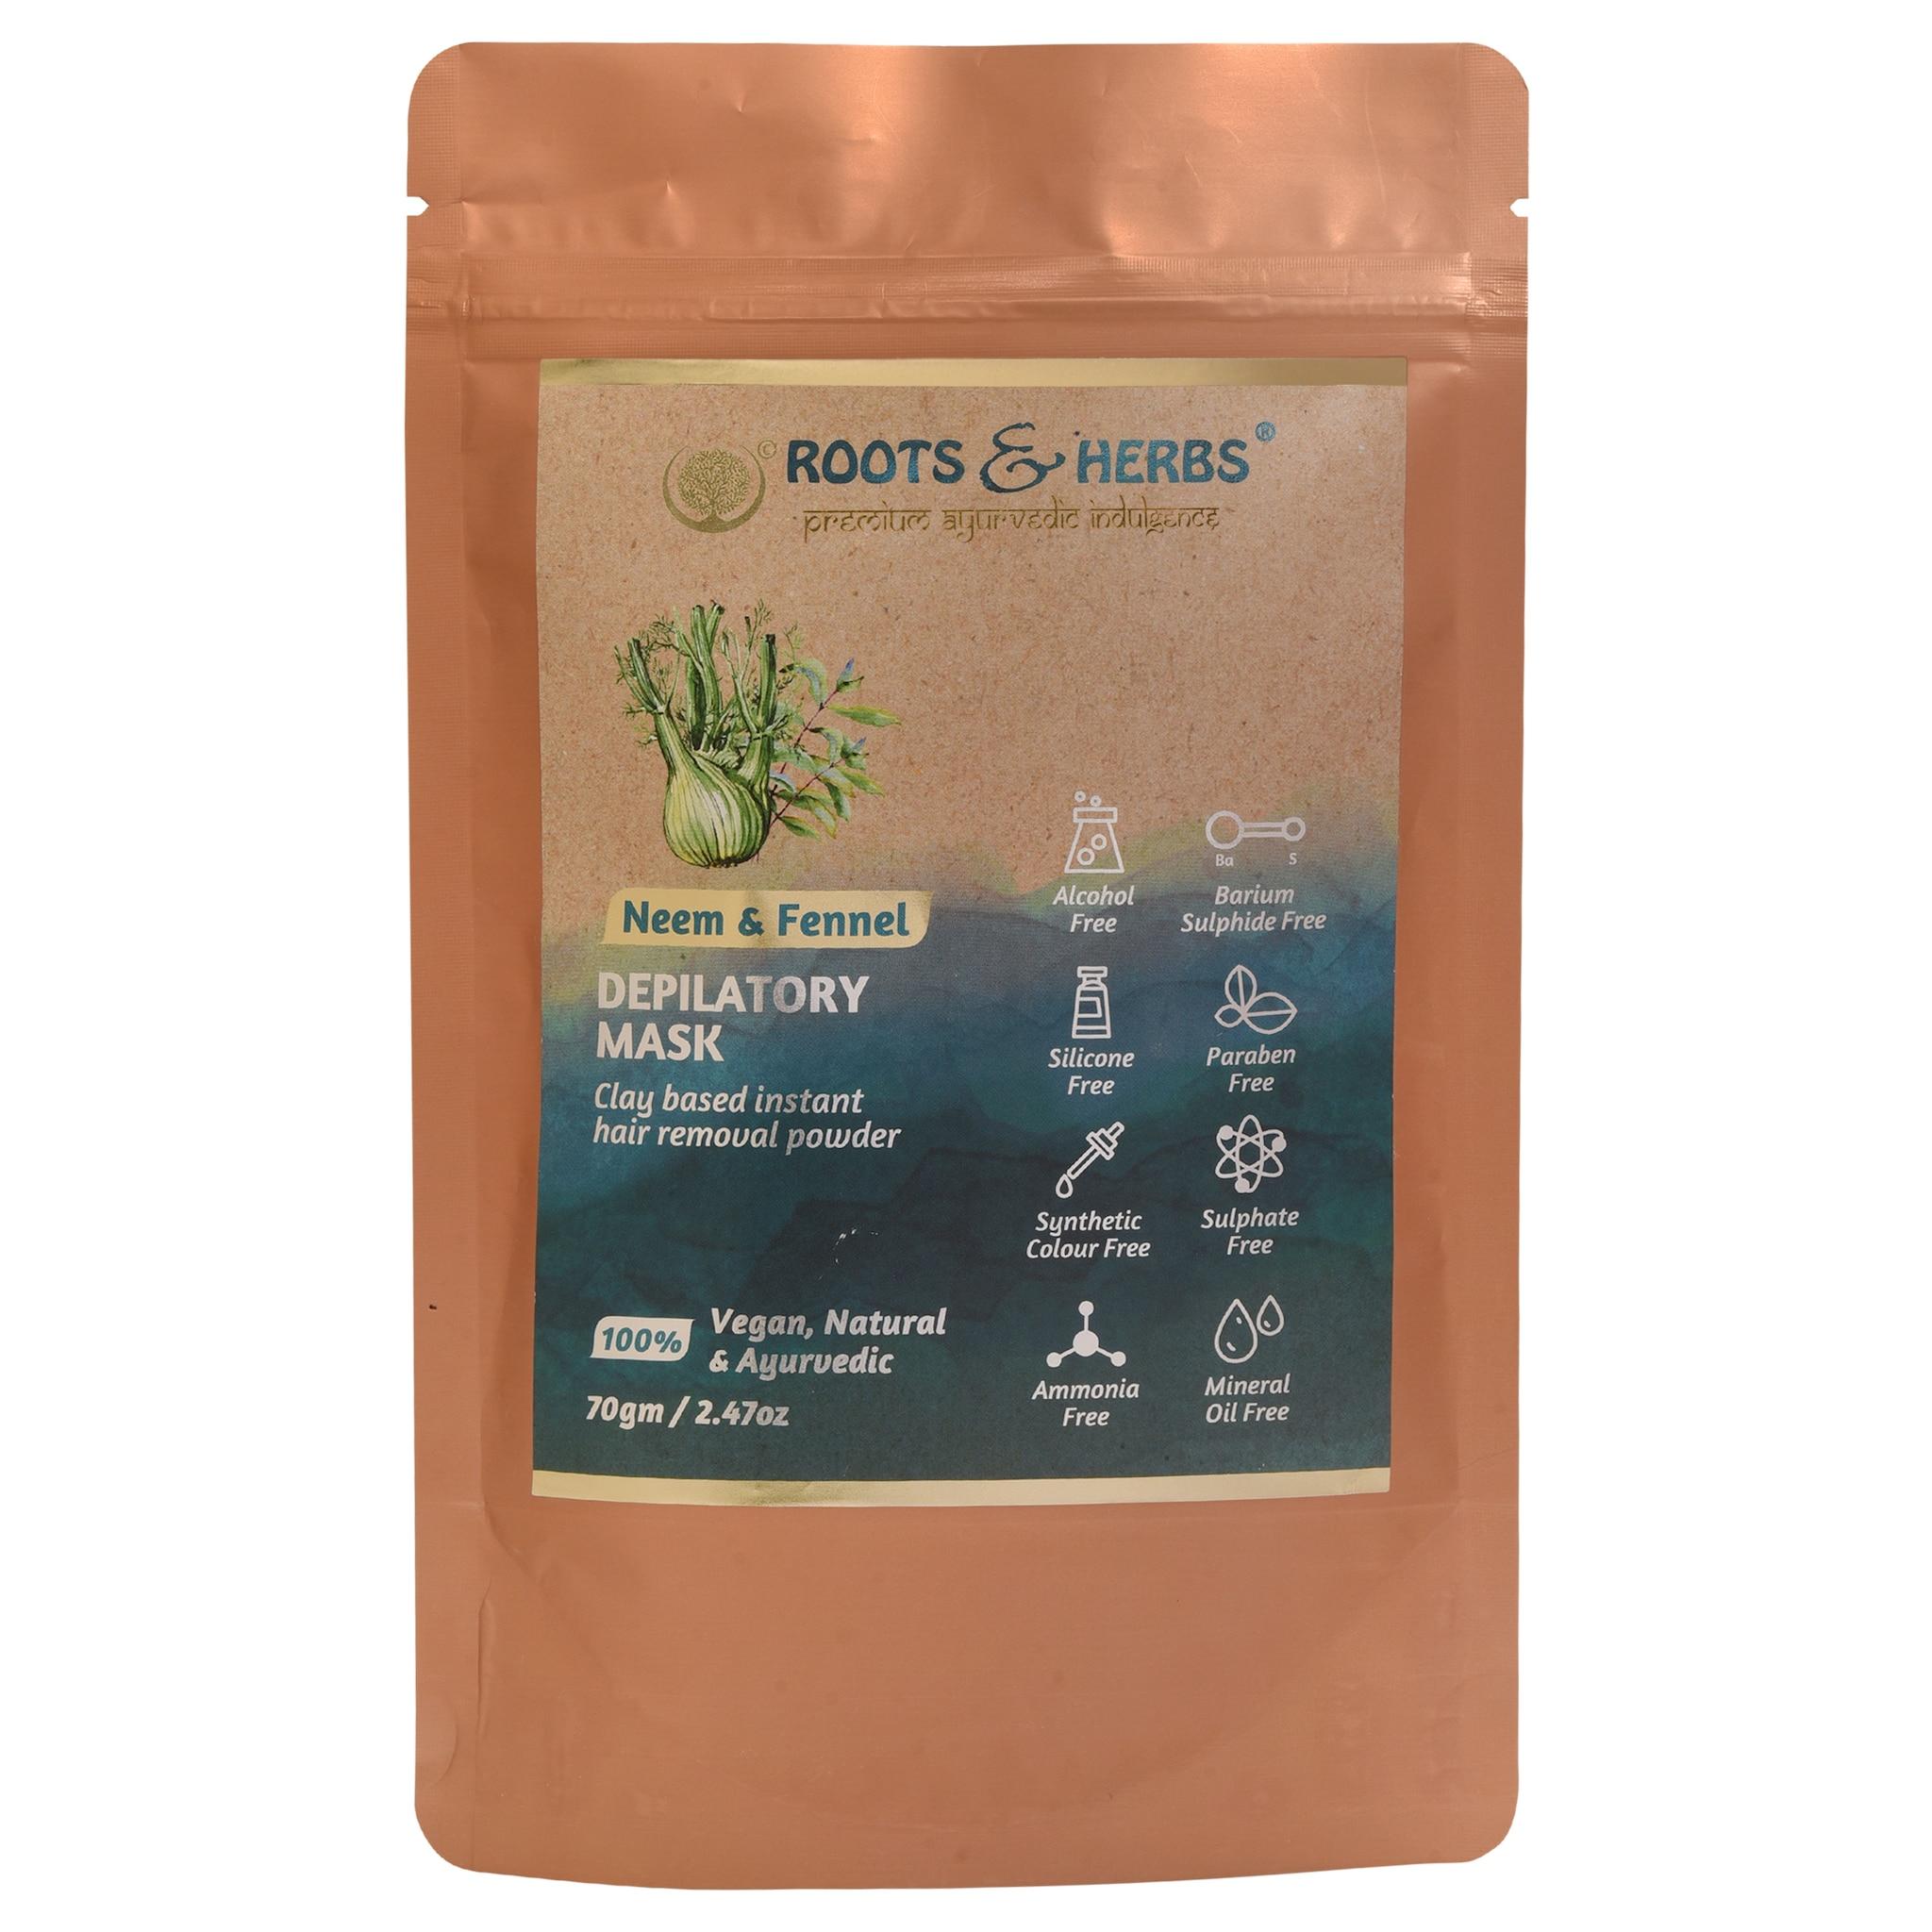 Roots & Herbs Neem & Fennel Depilatory Mask (70gm)